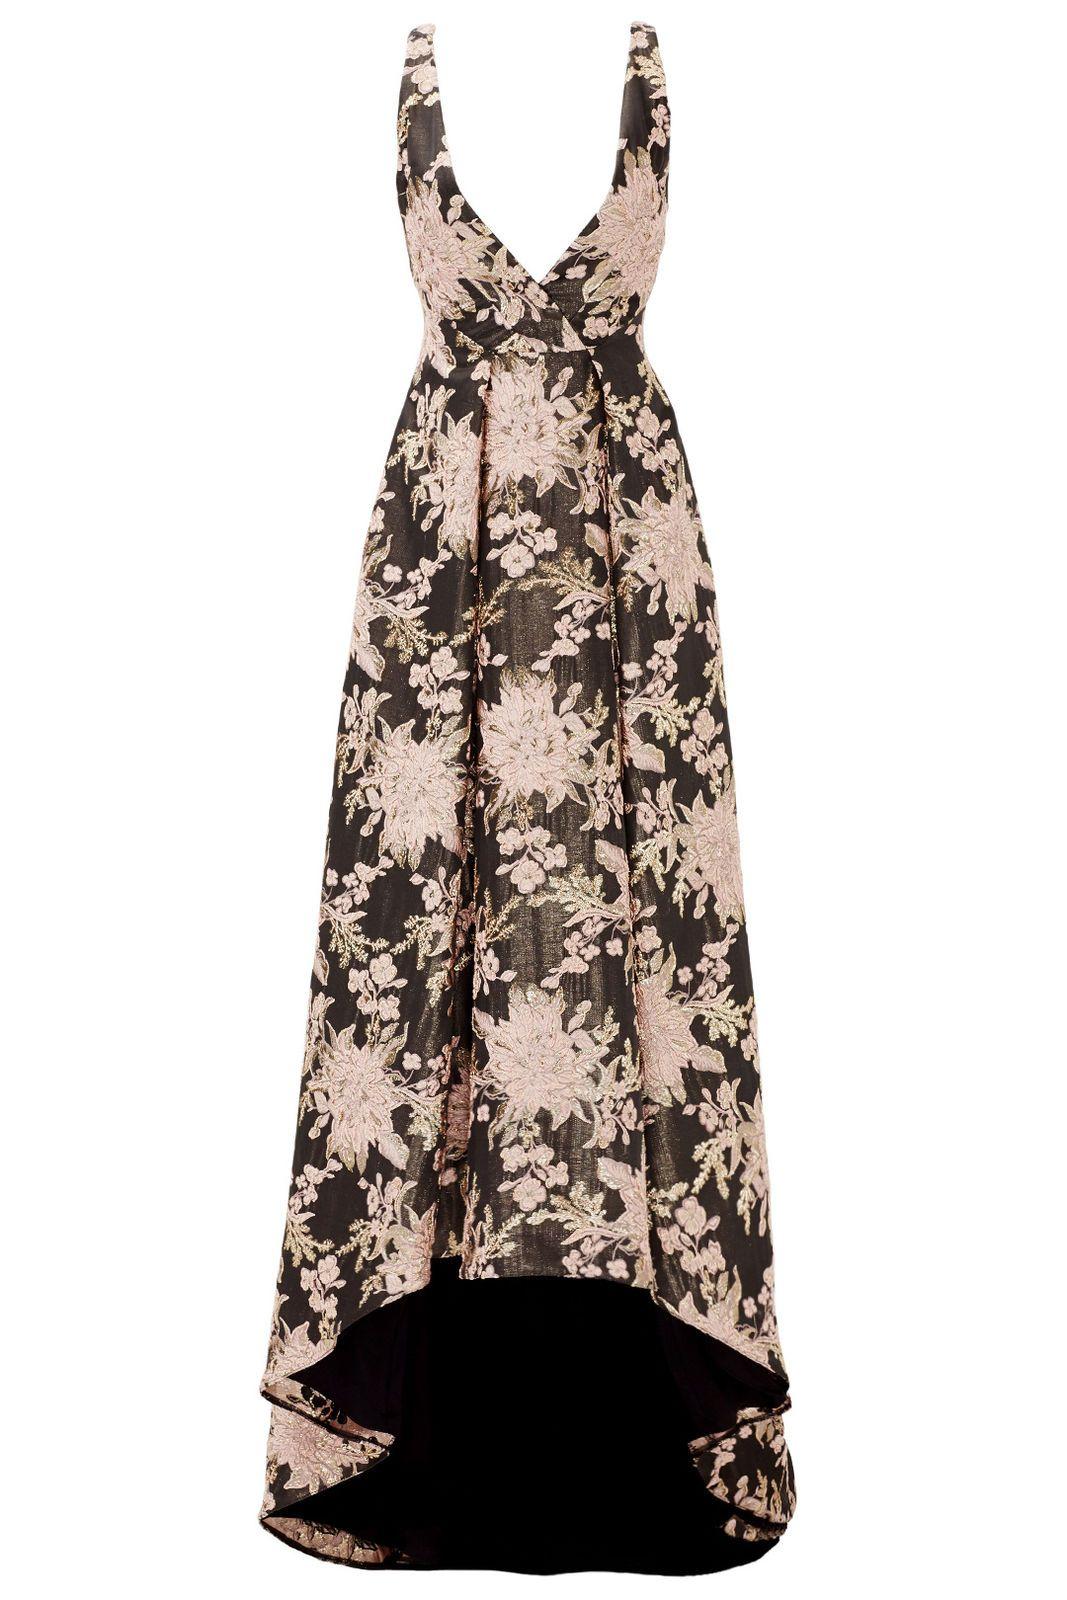 Badgley Mischka Woman Floral-jacquard Dress Black Size 2 Badgley Mischka Shop Offer Sale Online Best Sale Online Buy Cheap Latest EGGwegb